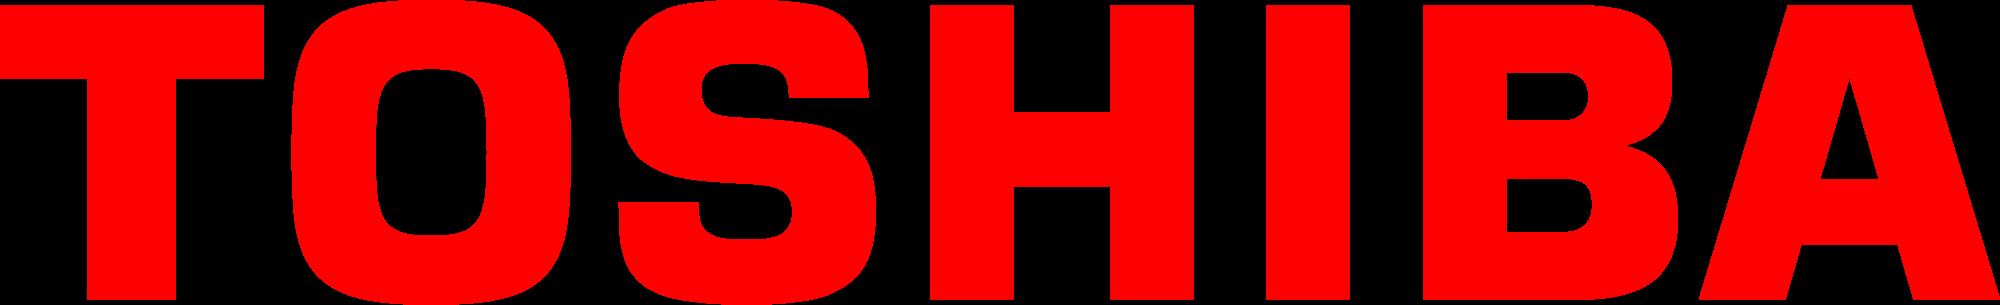 Télephone information entreprise  Toshiba